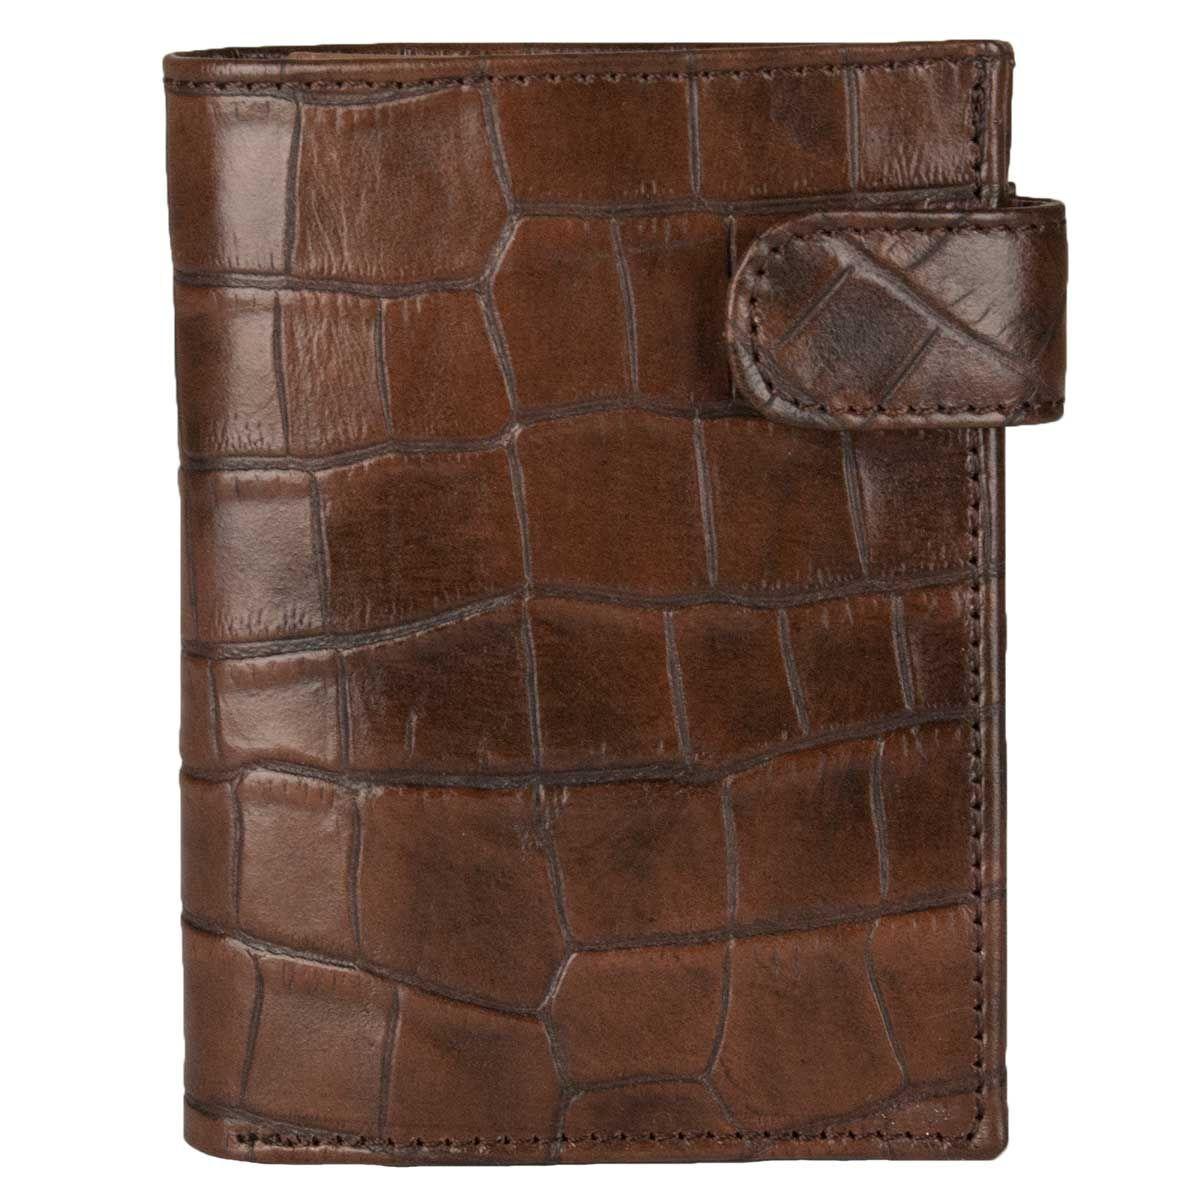 Montevita Leather Wallet in Brown